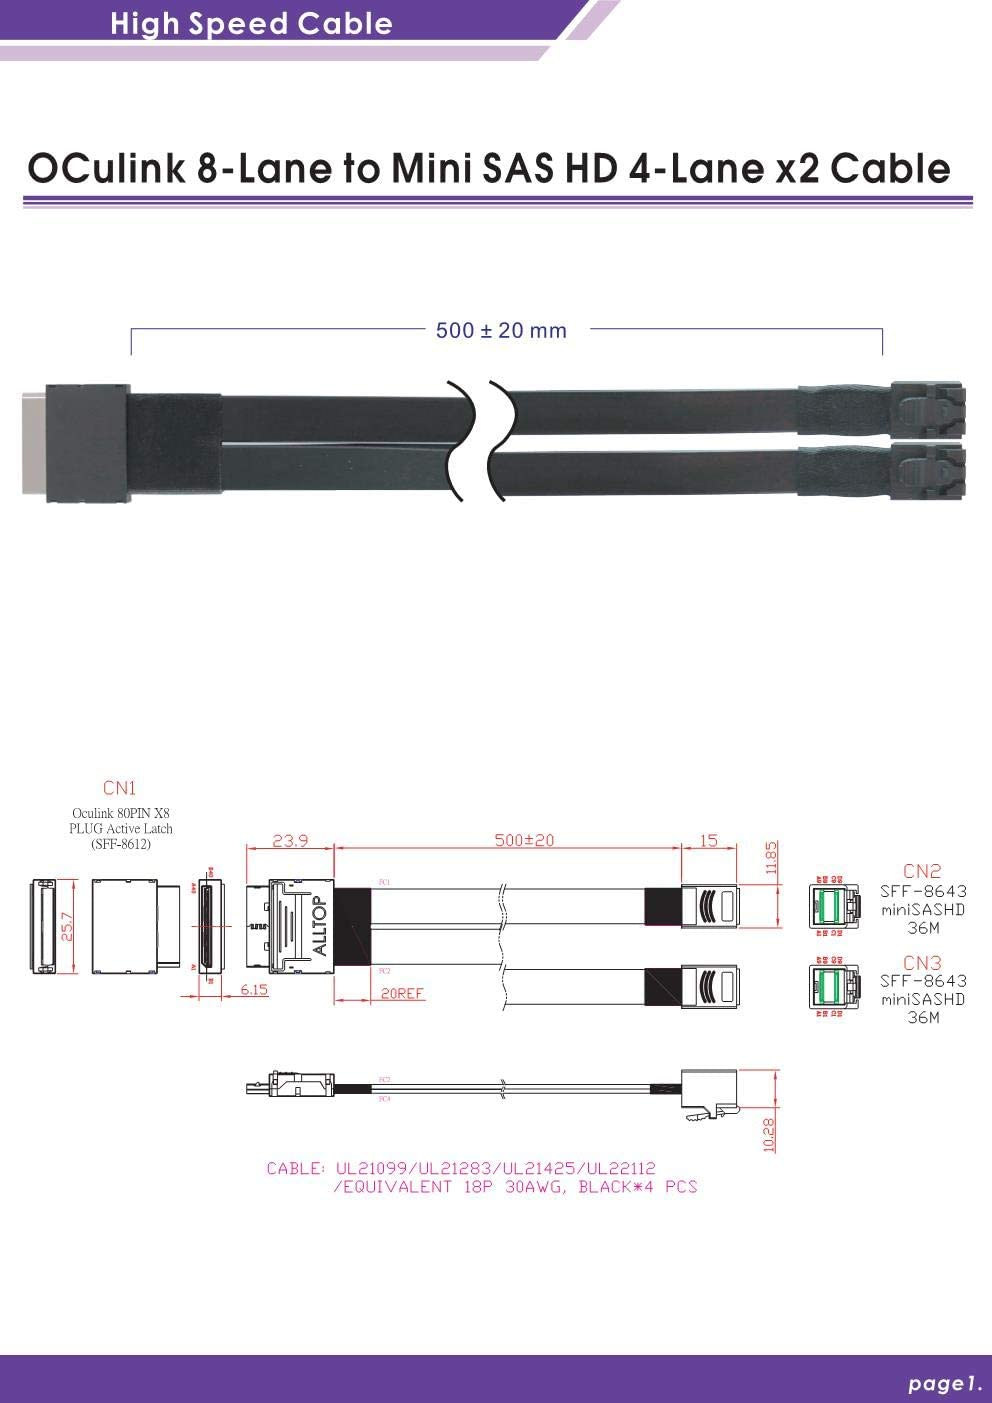 OCulink 8-Lane to Mini SAS HD 4-Lane x2 Cable OCulink 8-Lane to Mini SAS HD 4-Lane x2 Cable